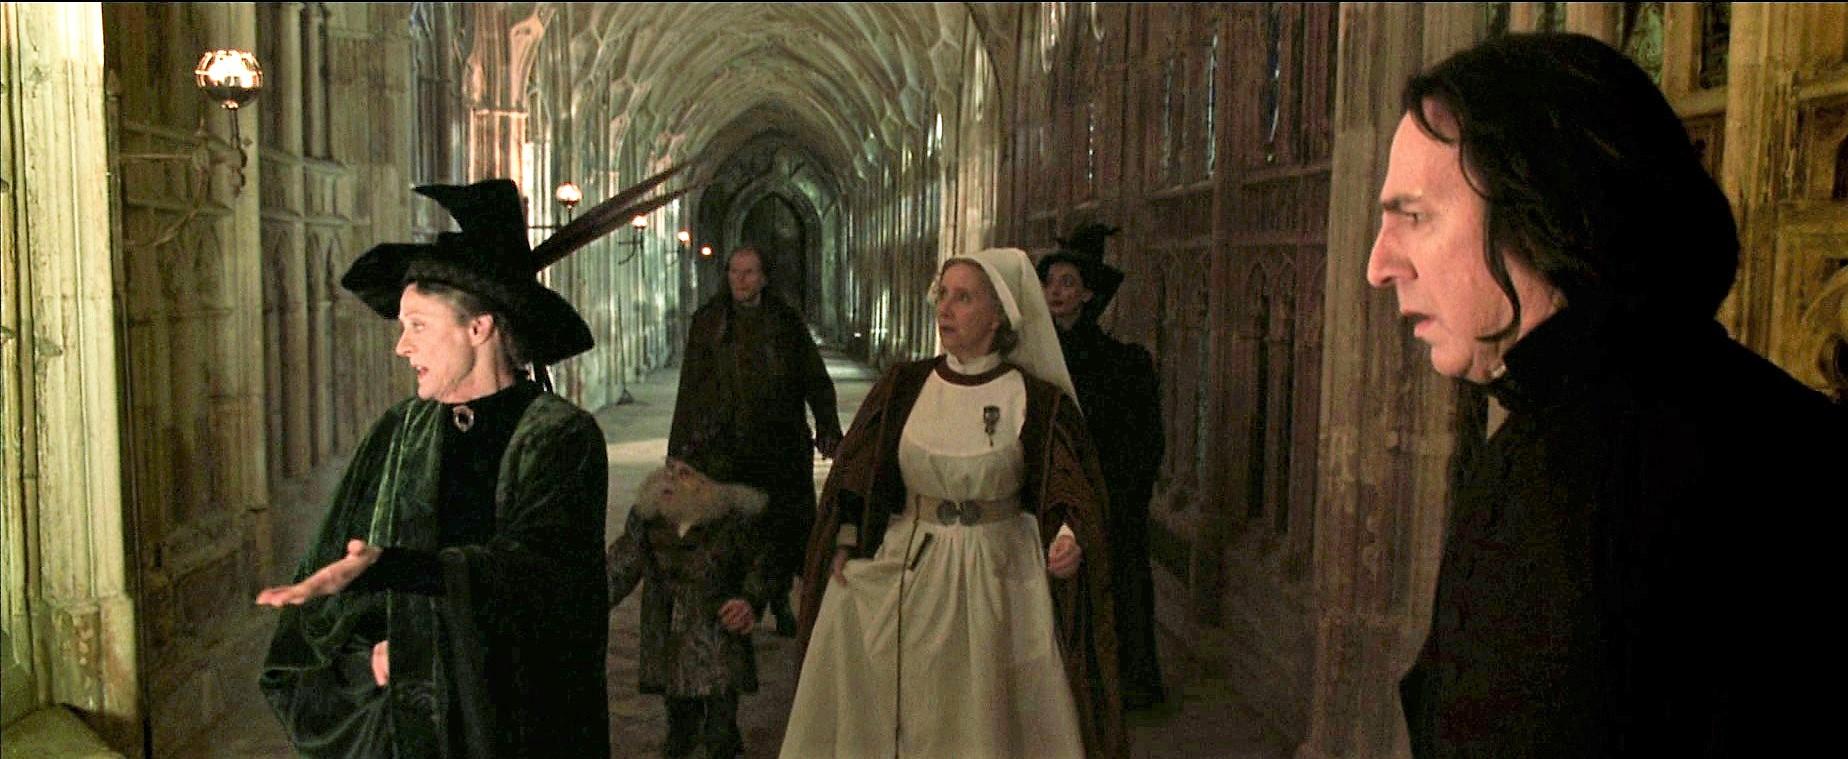 Alan Rickman, Warwick Davis, Maggie Smith, David Bradley, Gemma Jones, and Sally Mortemore in Harry Potter and the Chamber of Secrets (2002)